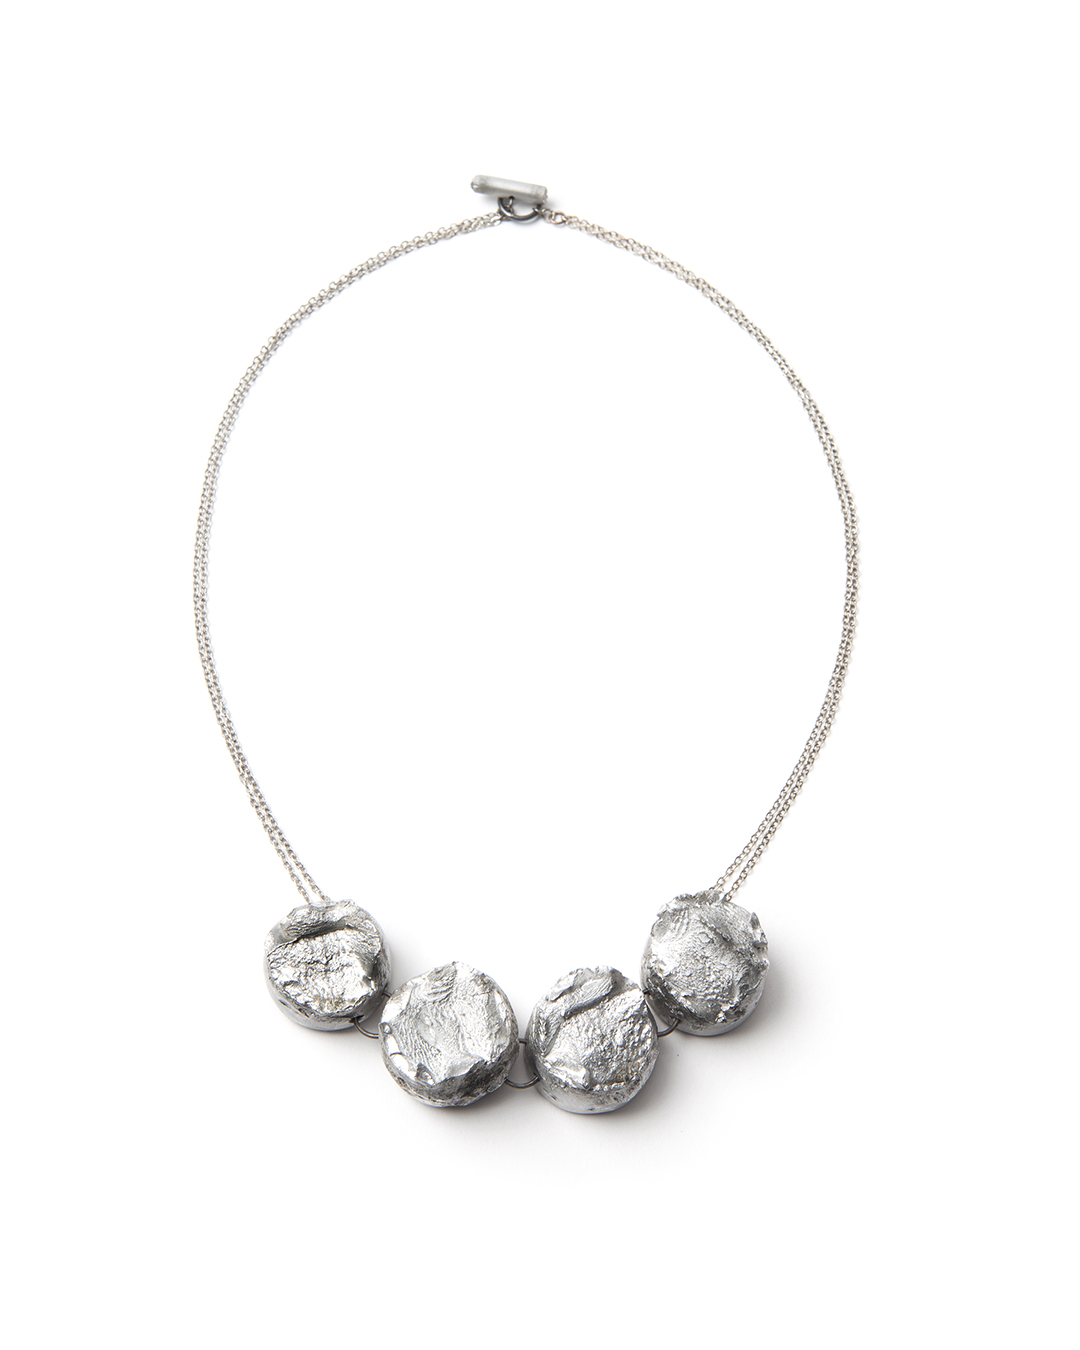 Barbara Schrobenhauser, Fractures I, 2015, necklace; aluminium, stainless steel, silver 450 x 20 x 18 mm, €1825